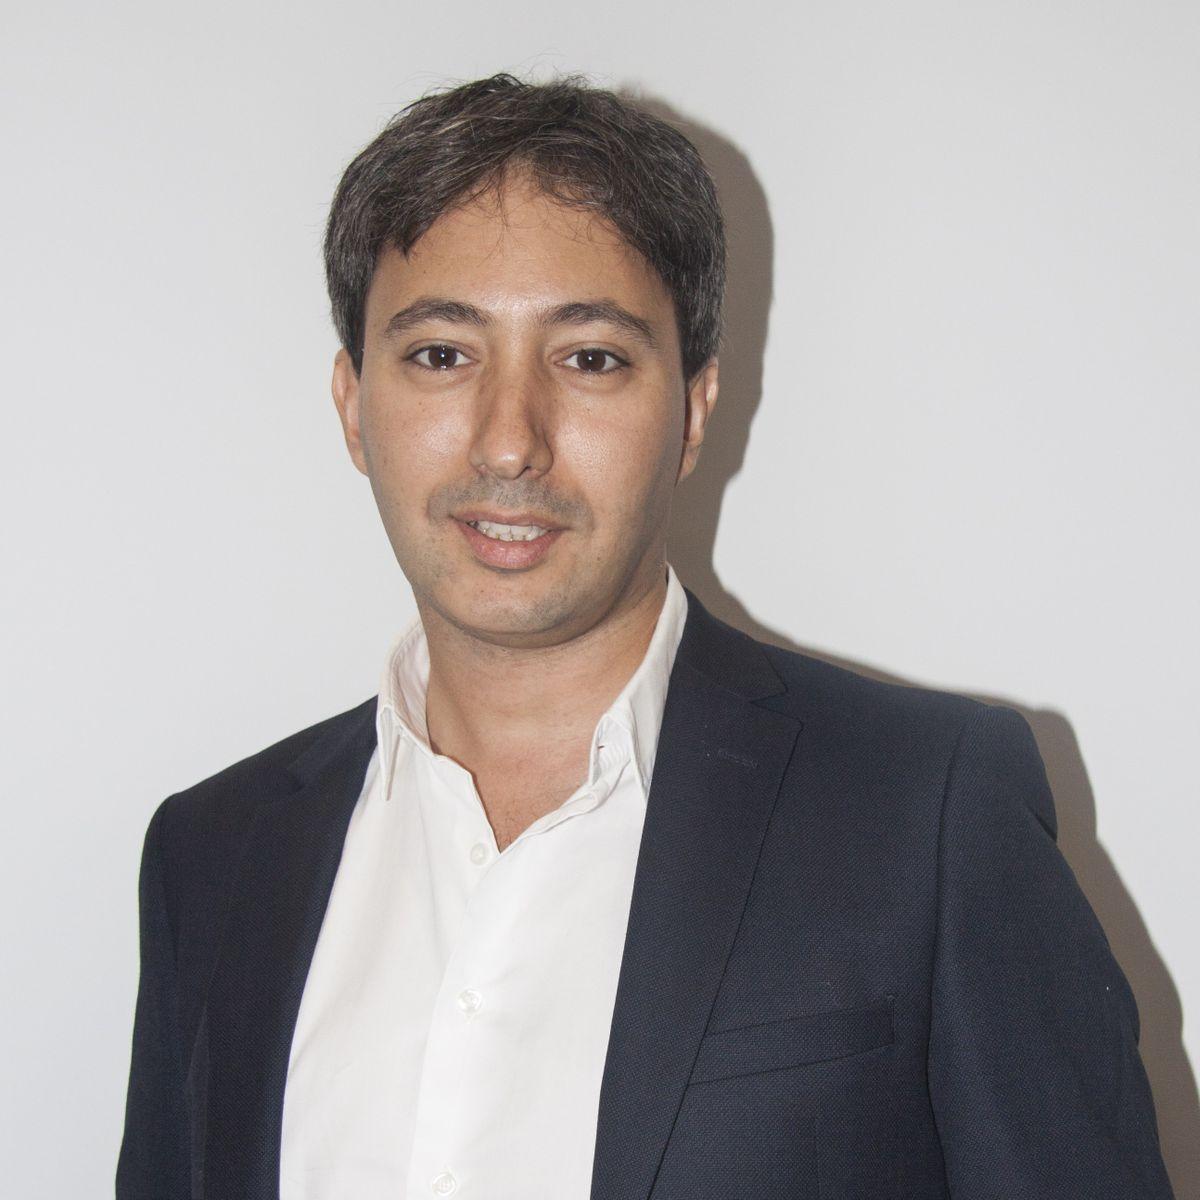 Stefano Augello